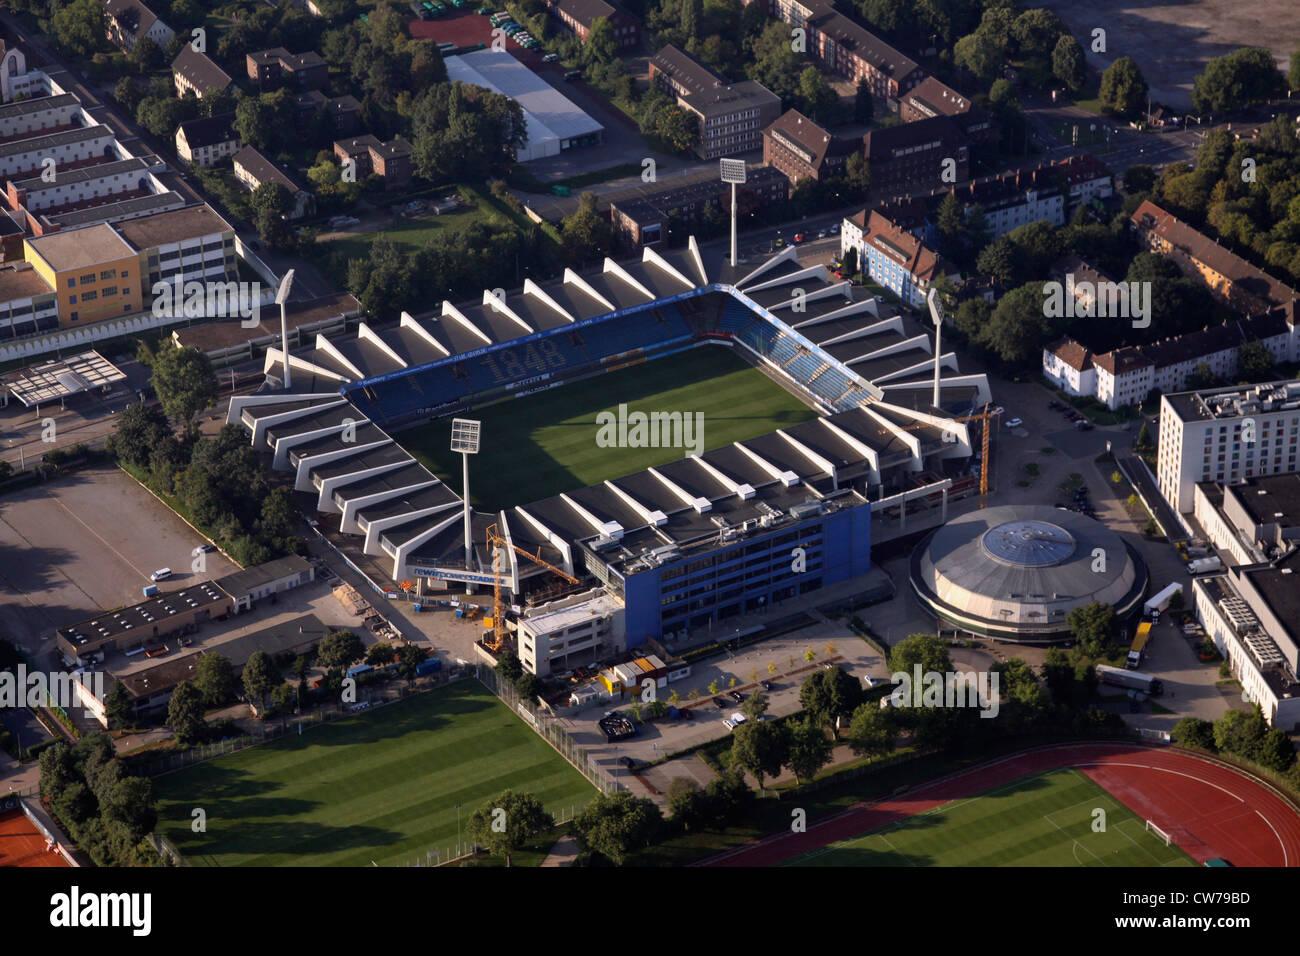 Rewirpower Stadion of VFL Bochum and round sport hall, Germany, North Rhine-Westphalia, Ruhr Area, Bochum - Stock Image